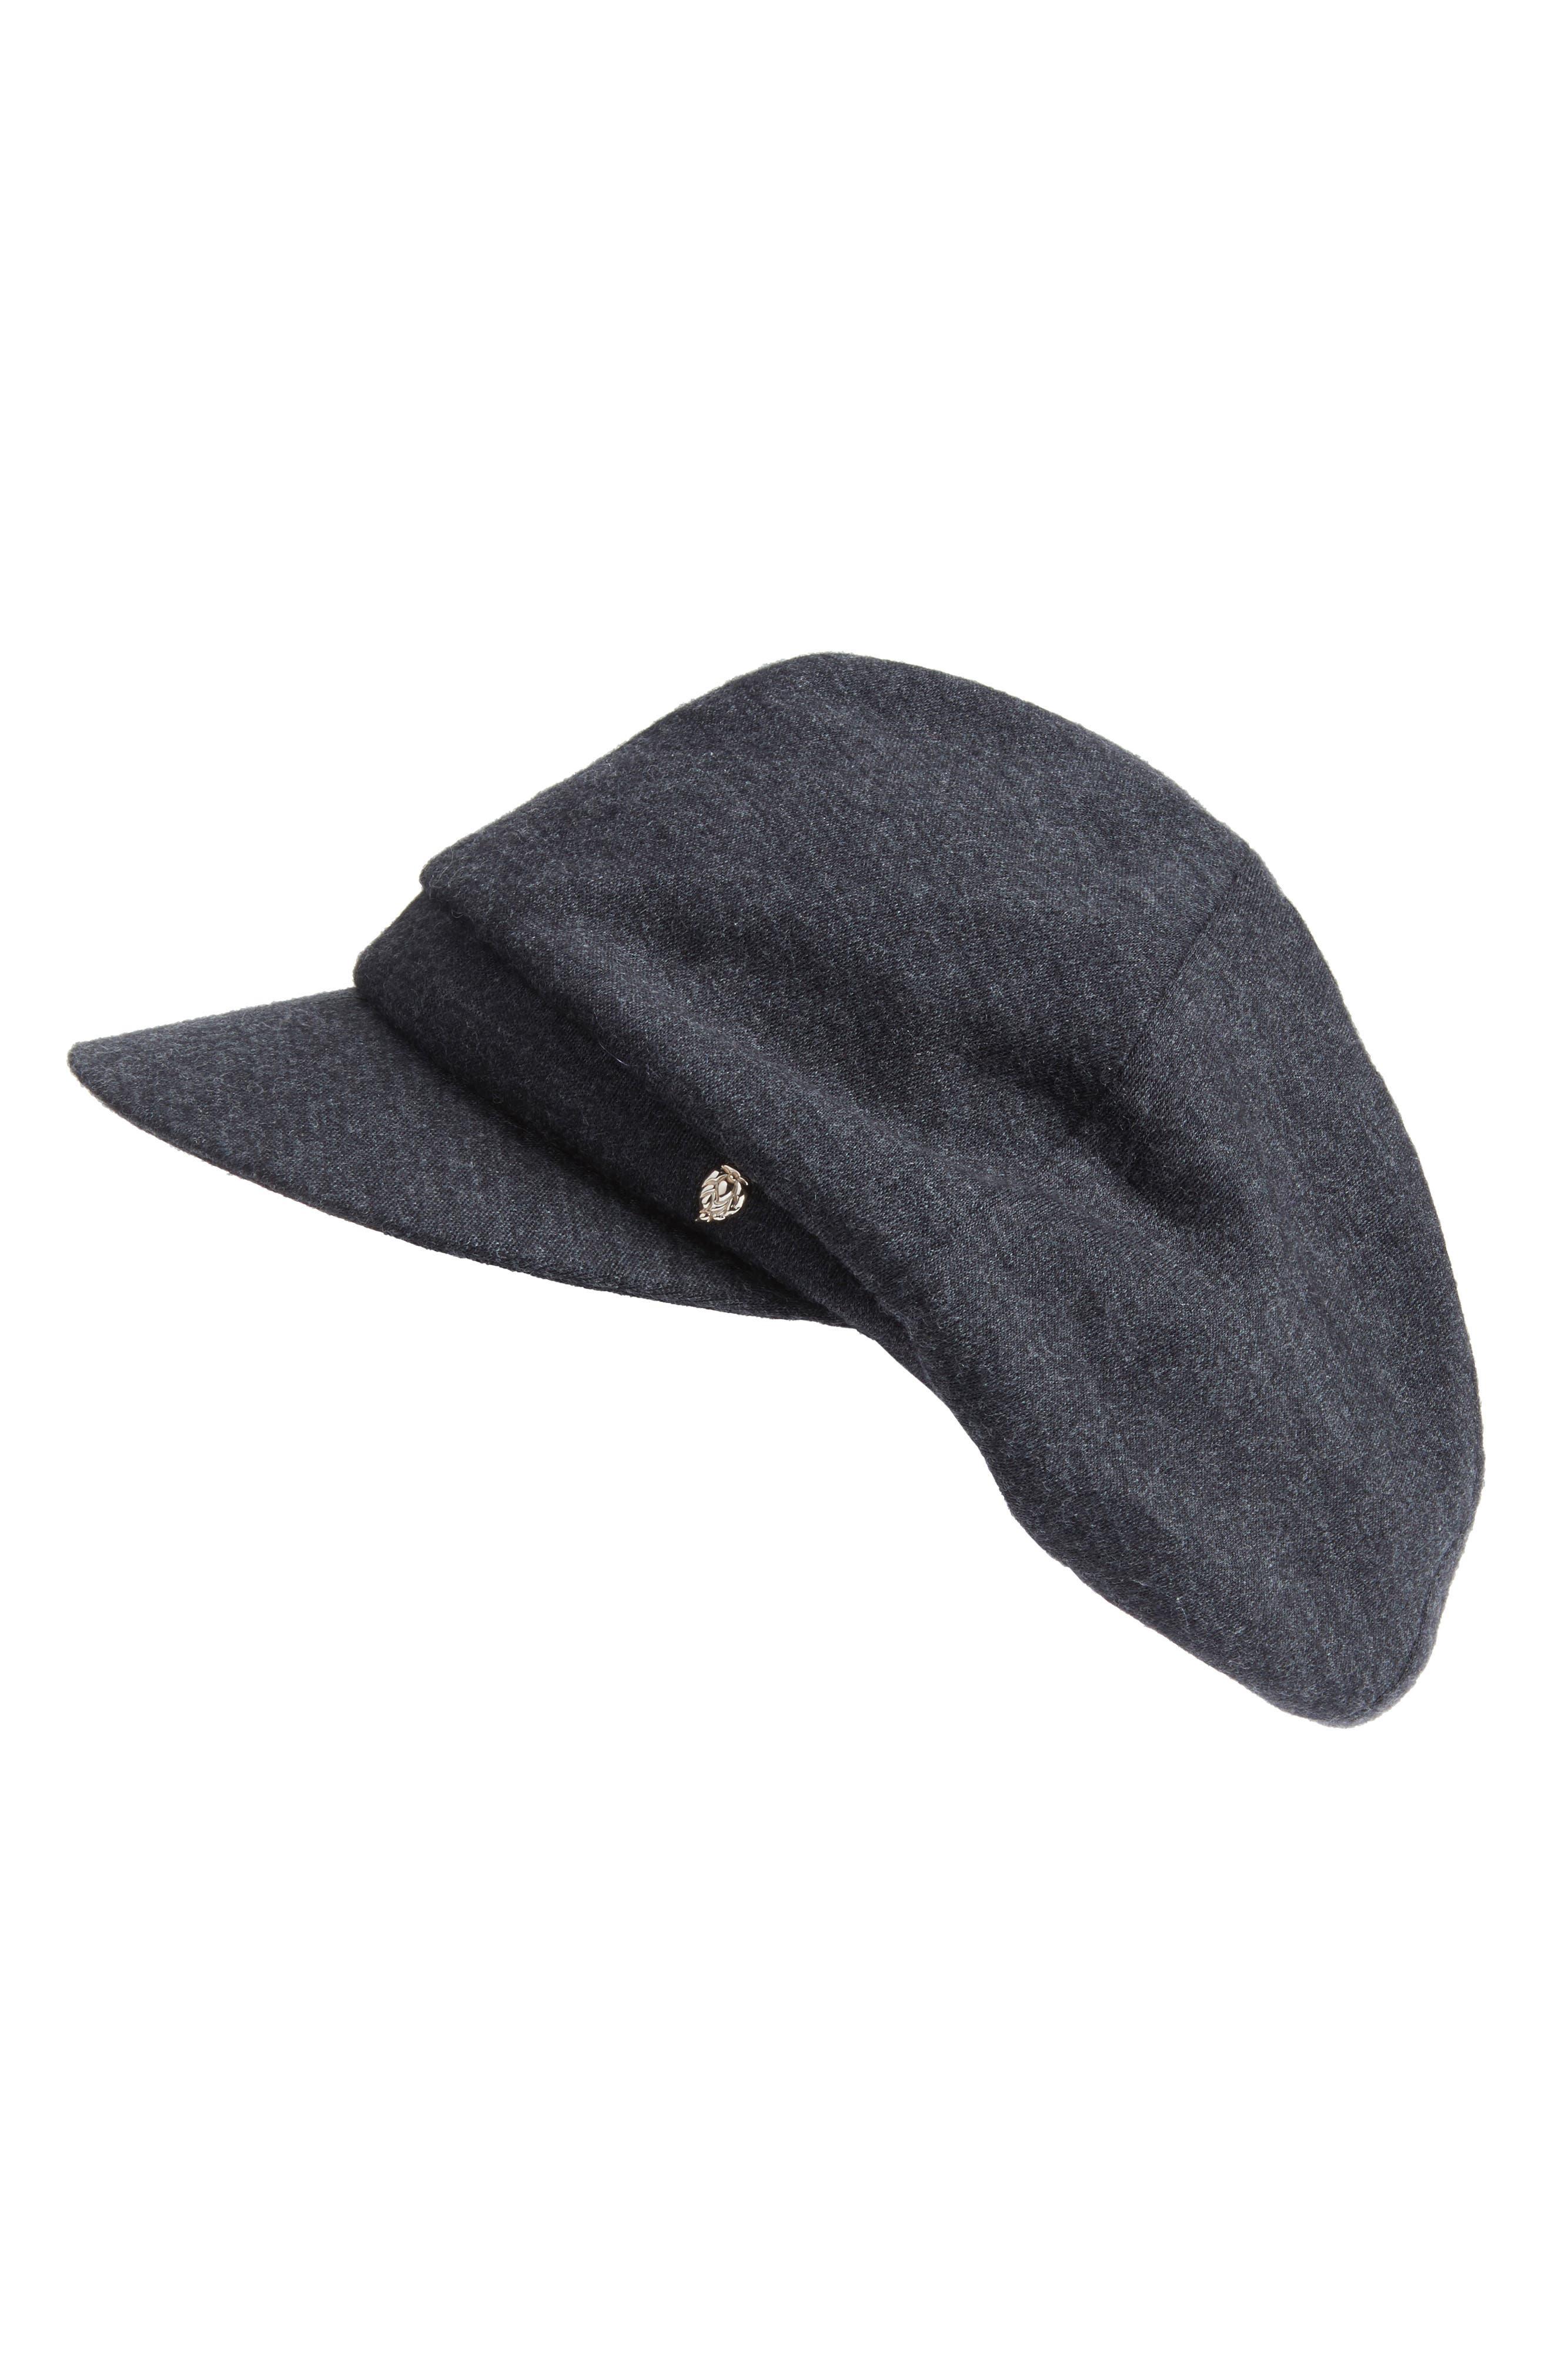 Helen Kaminski Merino Wool Baker Boy Cap